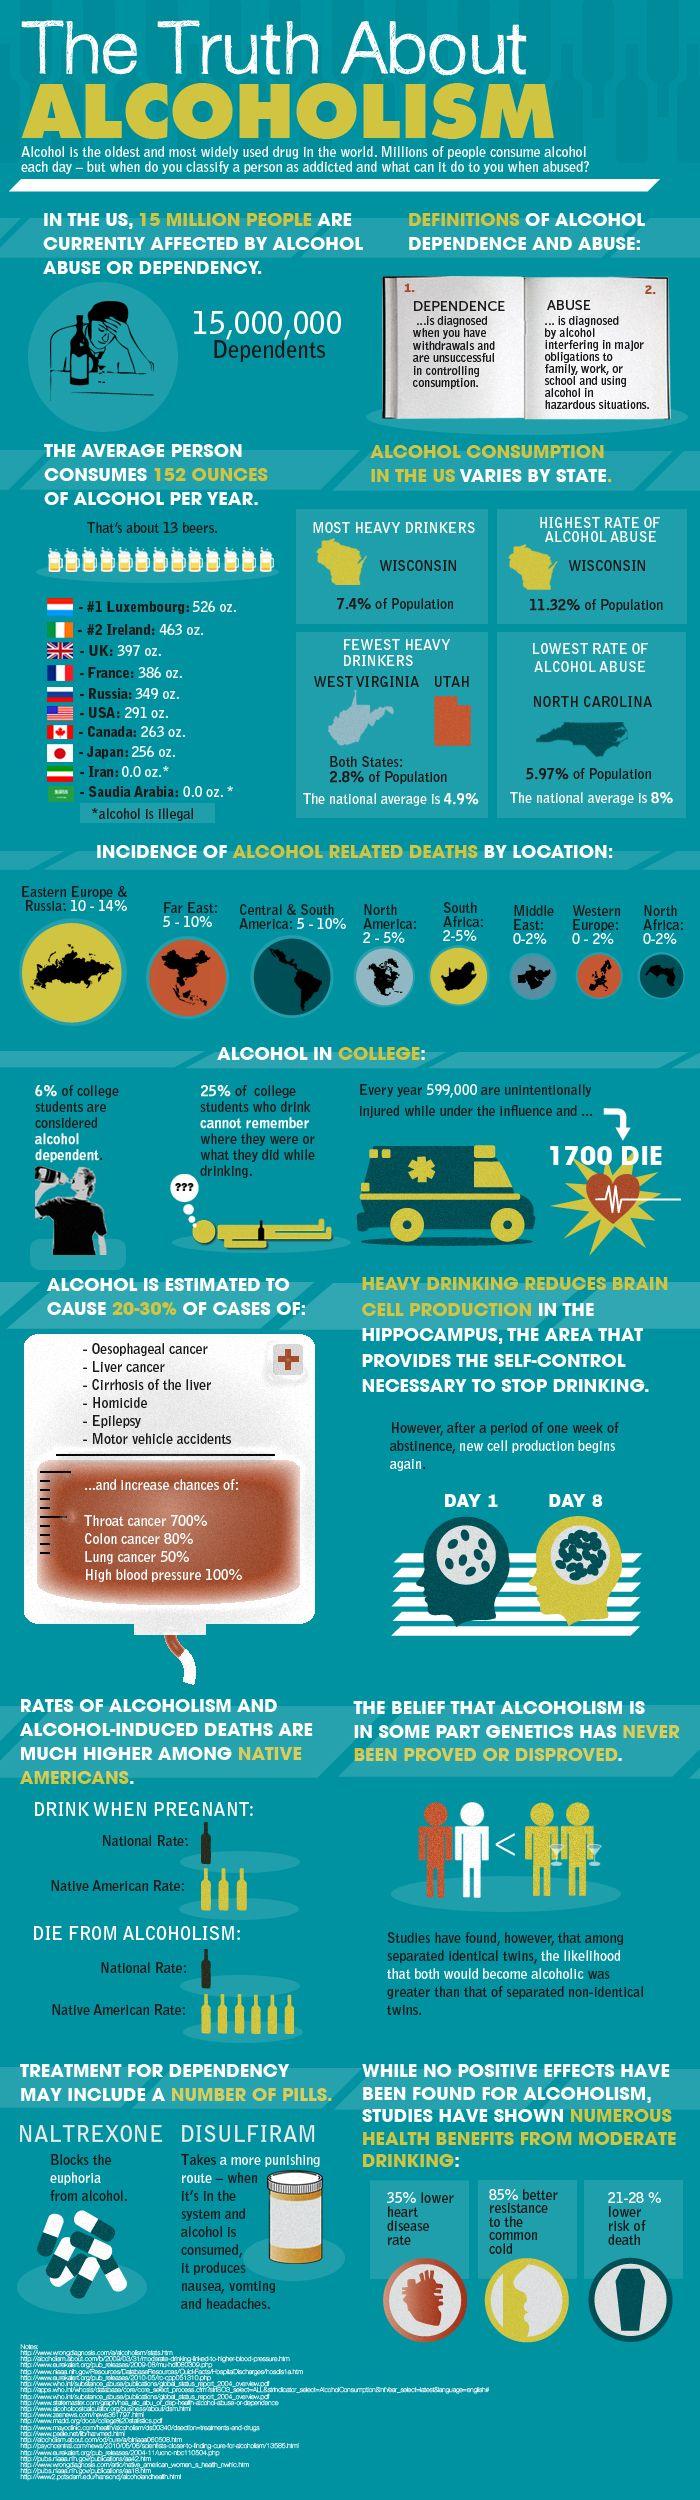 Alcoholism Infographic #alcohol #addiction #infographic